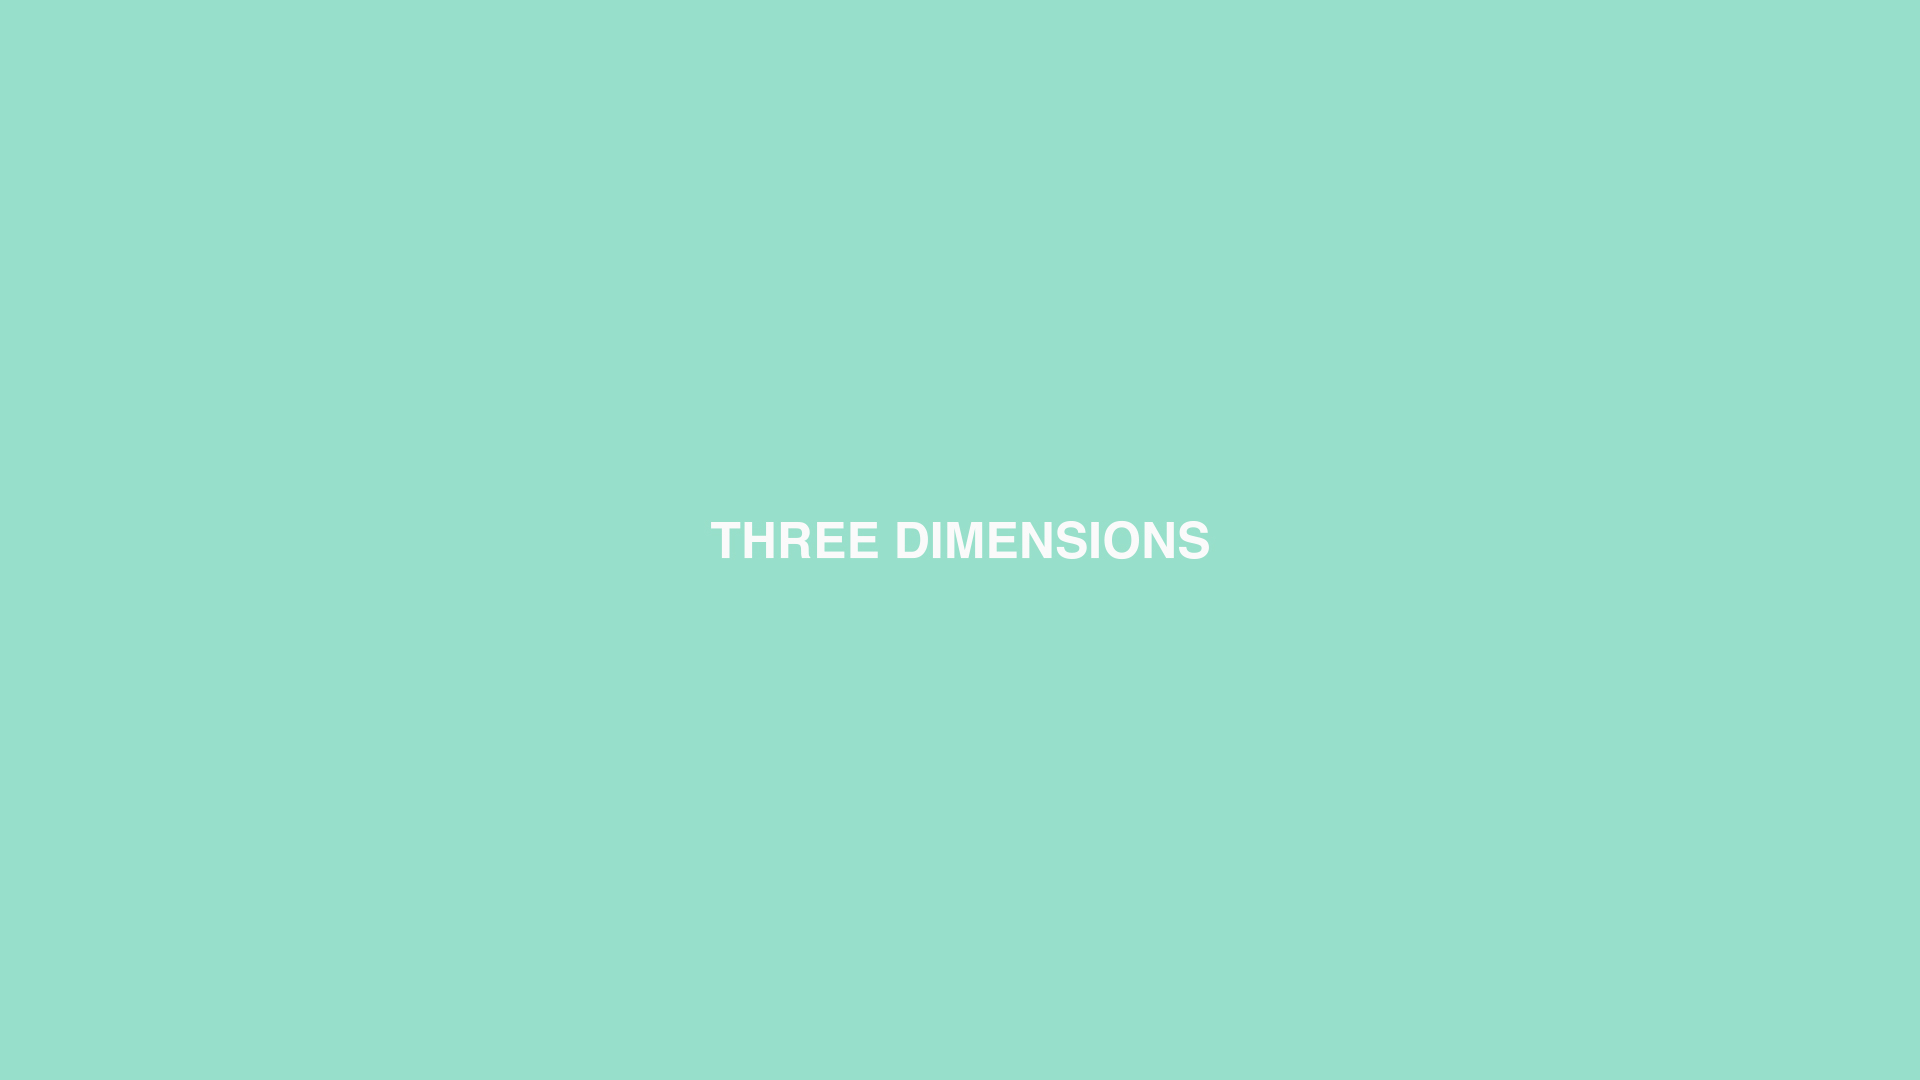 THREE DIMENSIONS Green.jpg